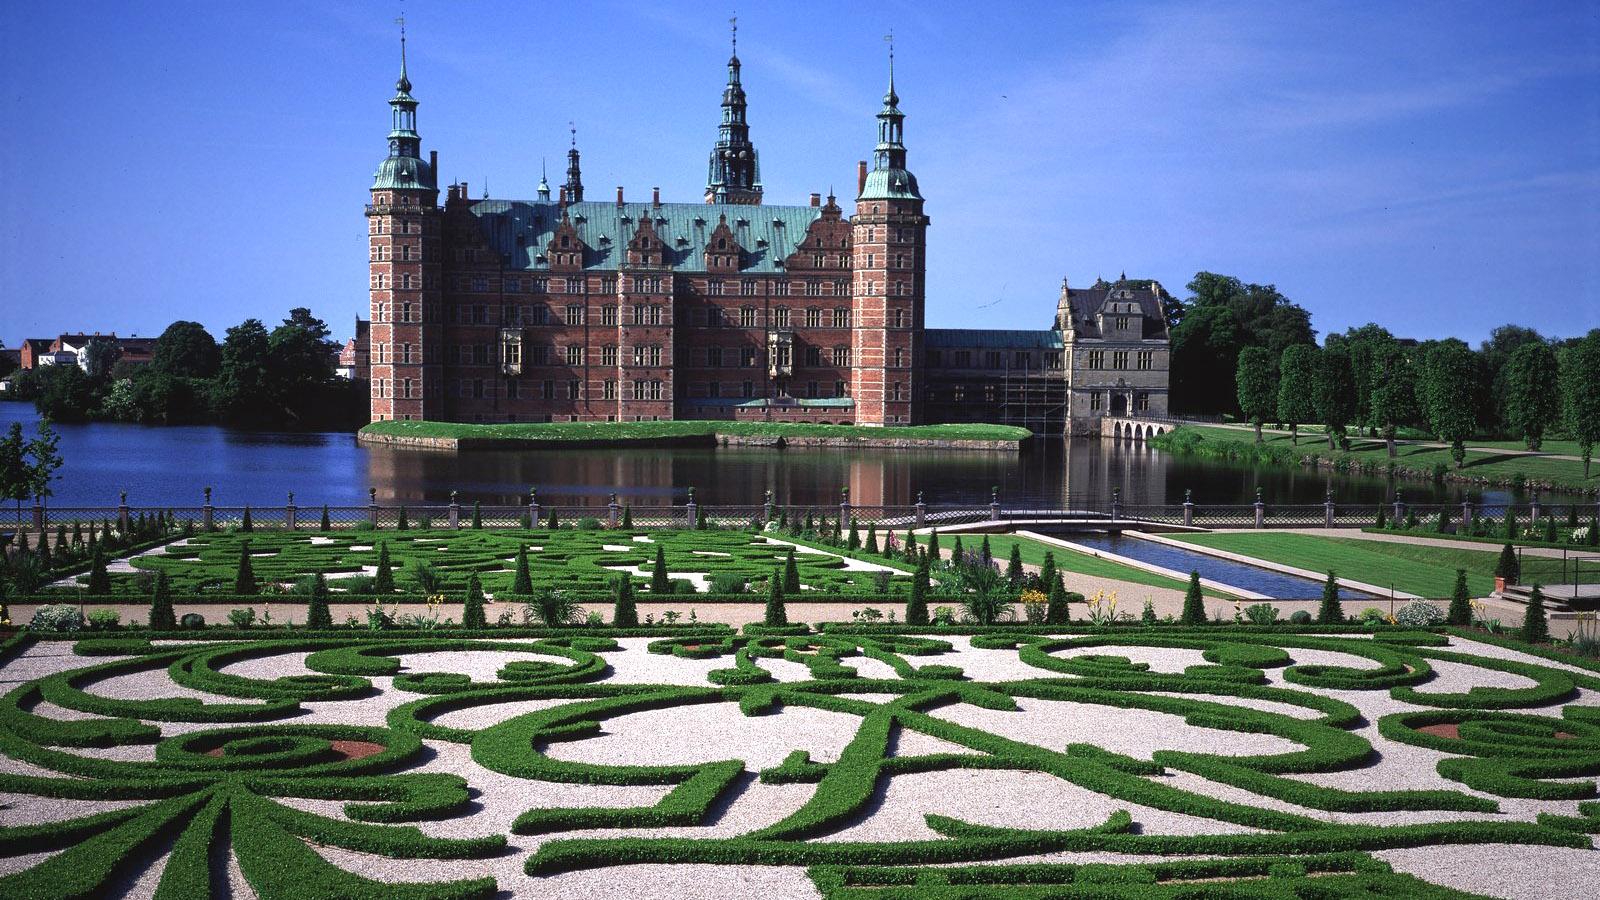 Seeland: Schloss Fredensborg in Hillerød. Foto: Presebild Visit Denmark ohne Namensnennung des Photographen.